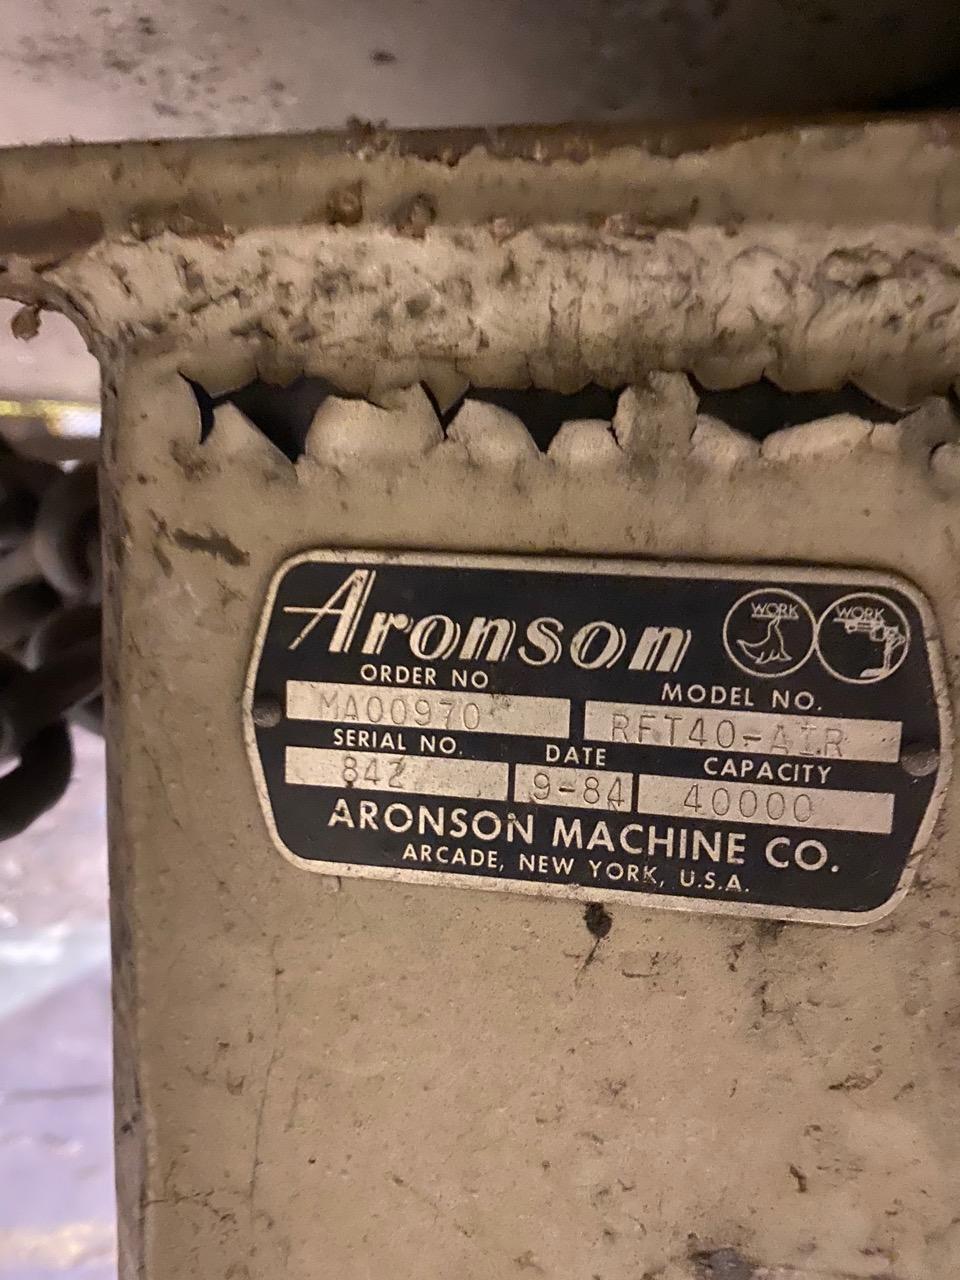 "132"" X 40,000 LB ARONSON RFT40 FLOOR ROTATING WELDING POSITIONER. STOCK # 1056820"